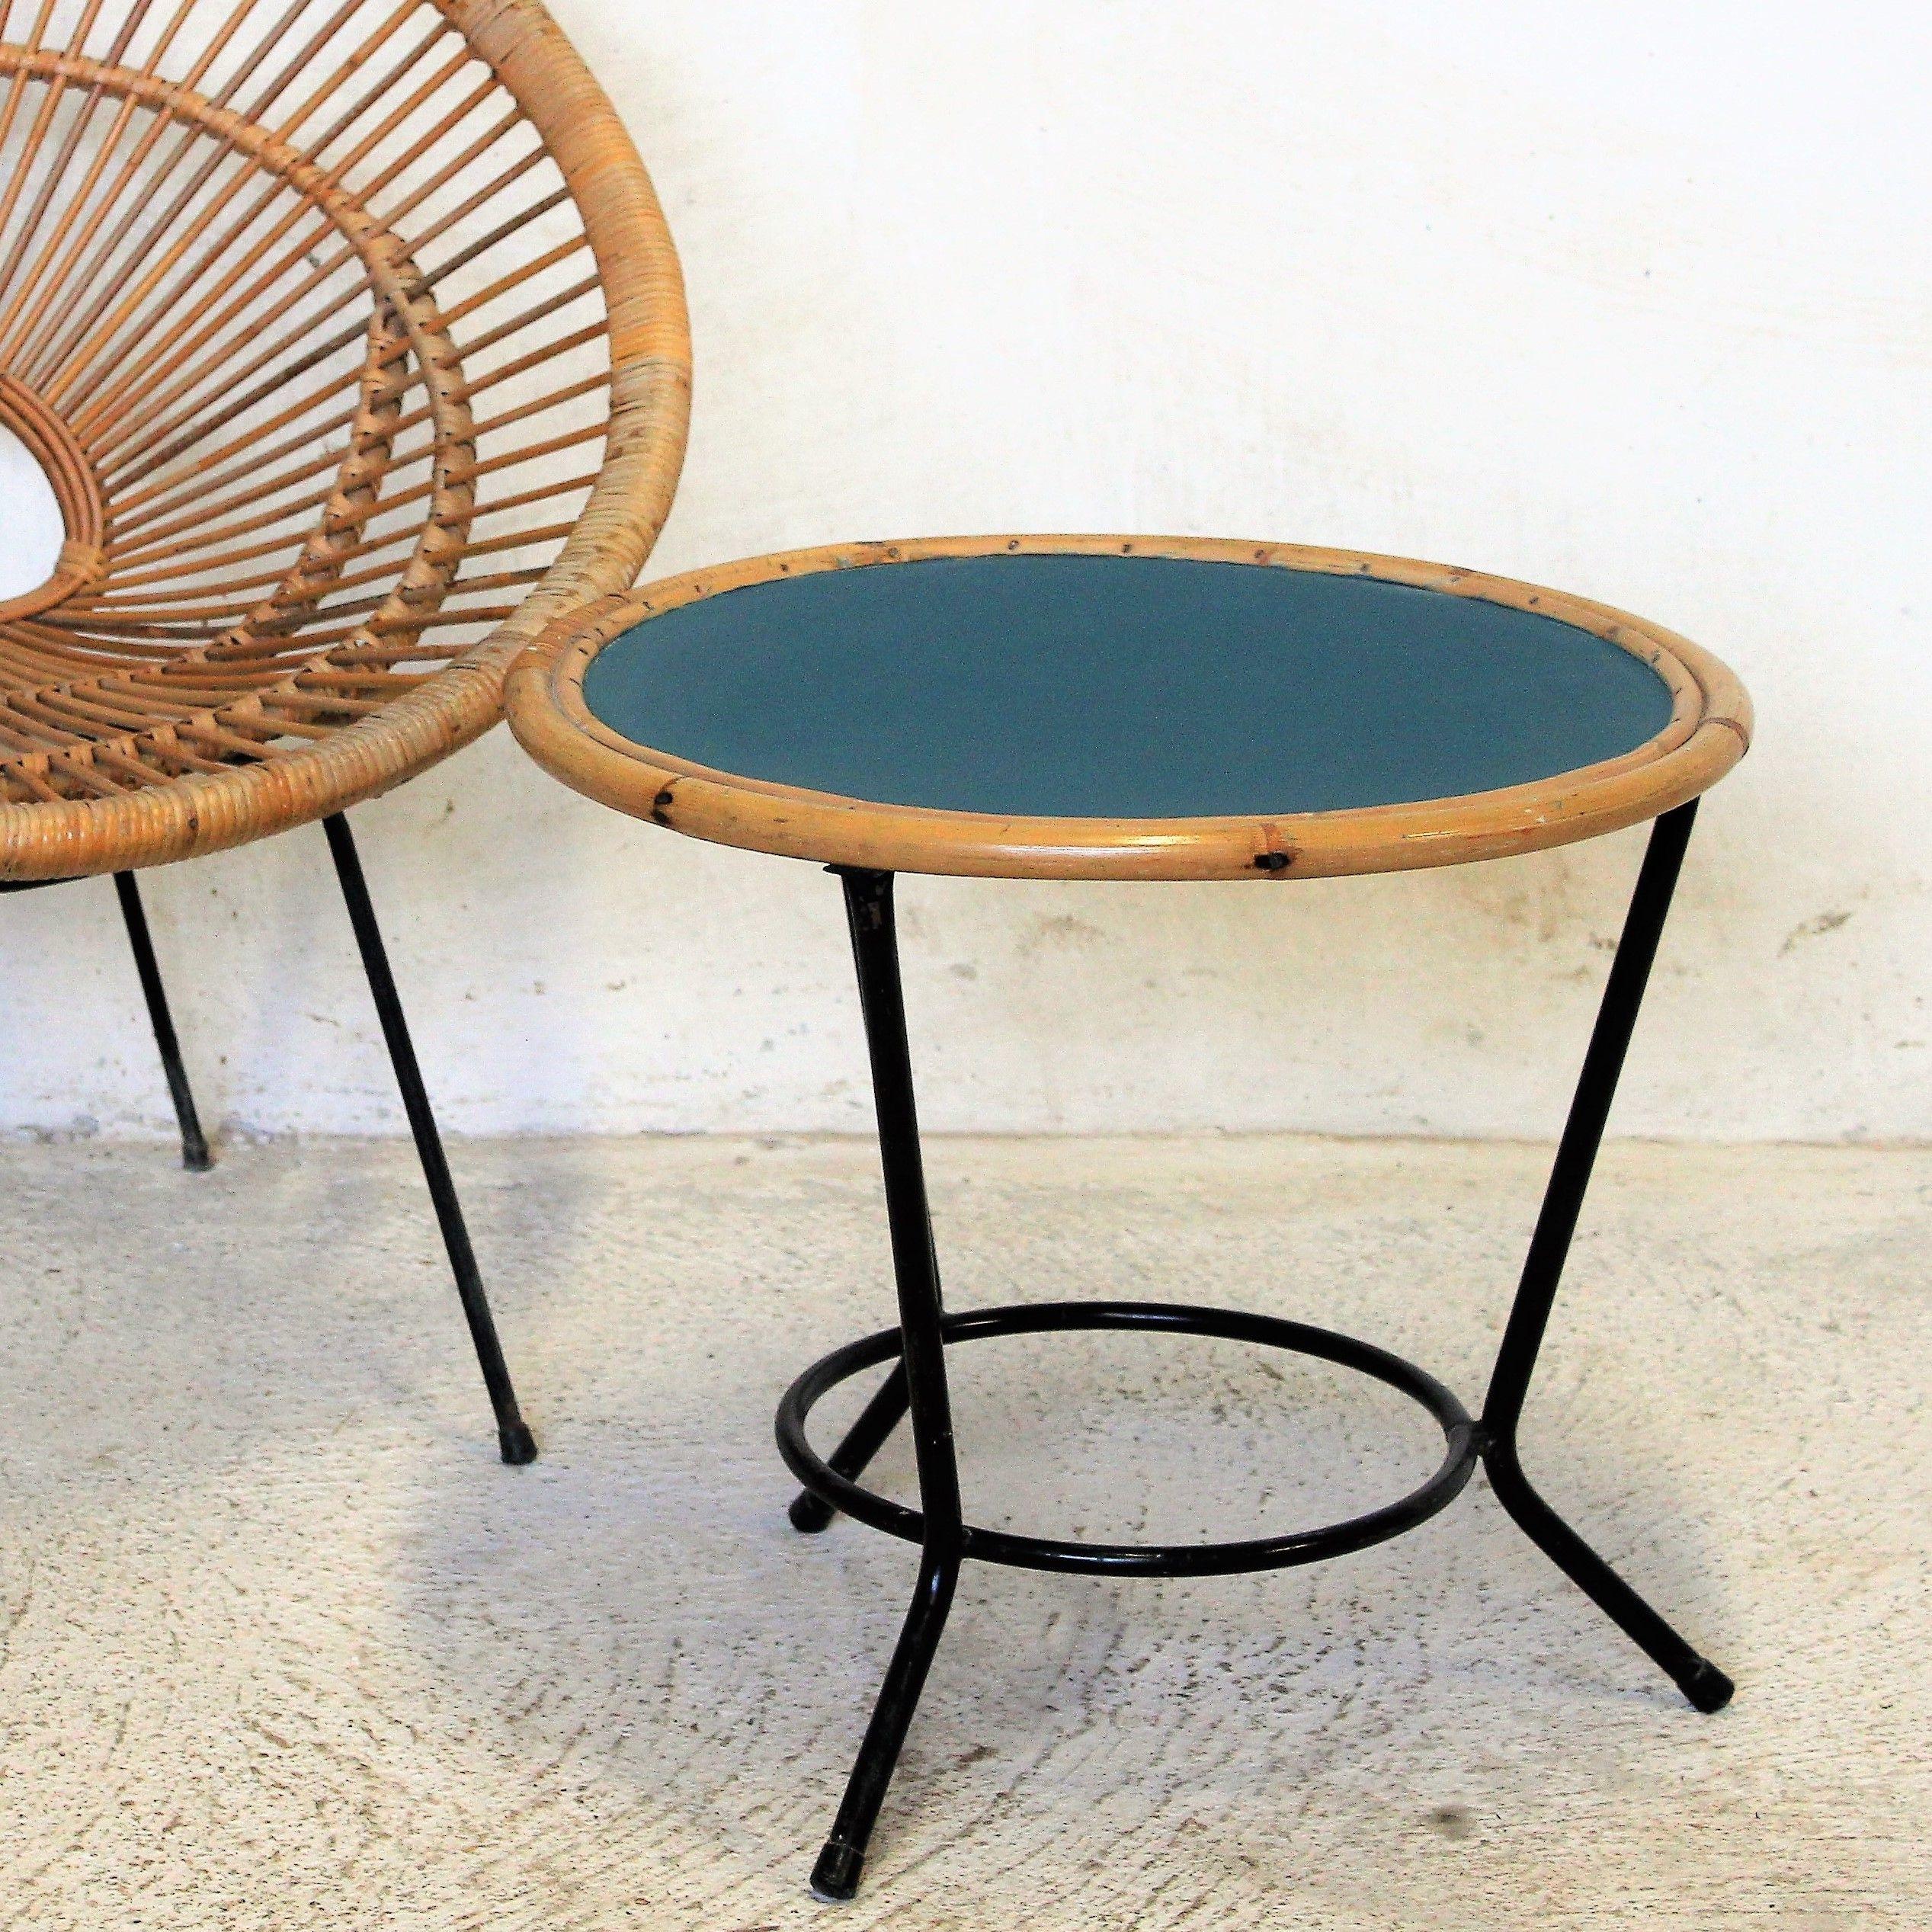 table basse vintage rotin mtal fibresendeco vannerie artisanale mobilier vintage - Mobilier Vintage